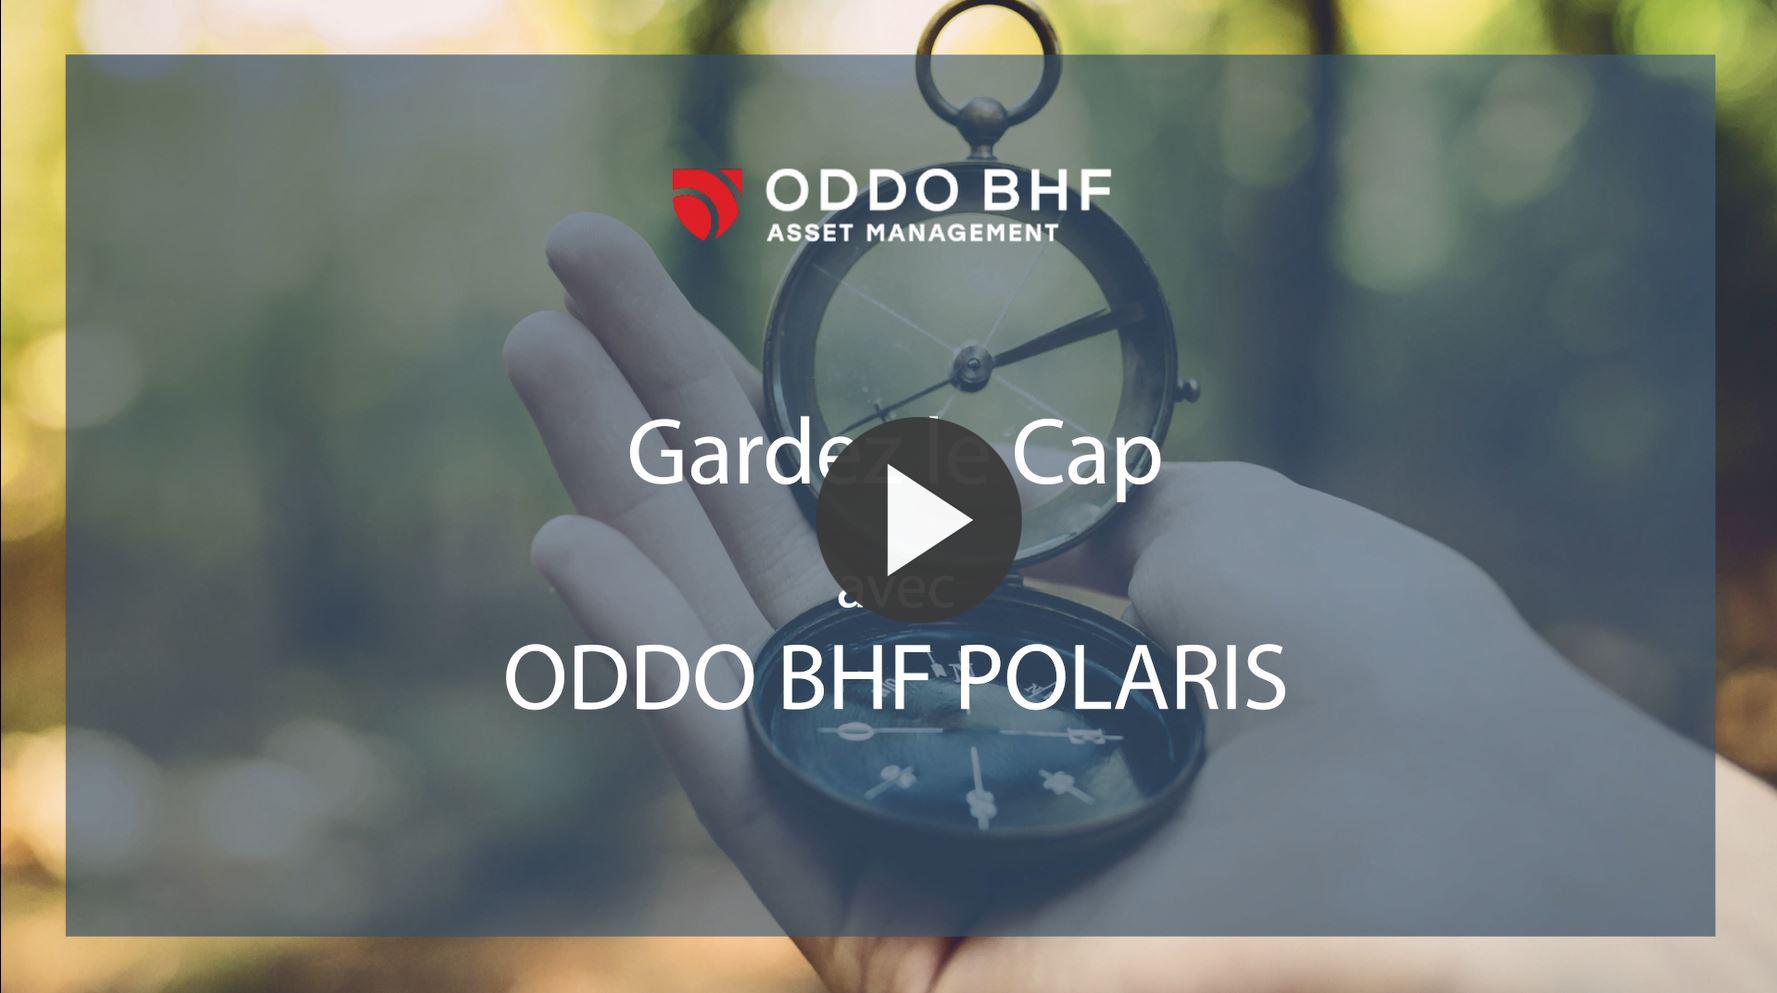 Visuel-vidéo-Polaris-FR (002).png